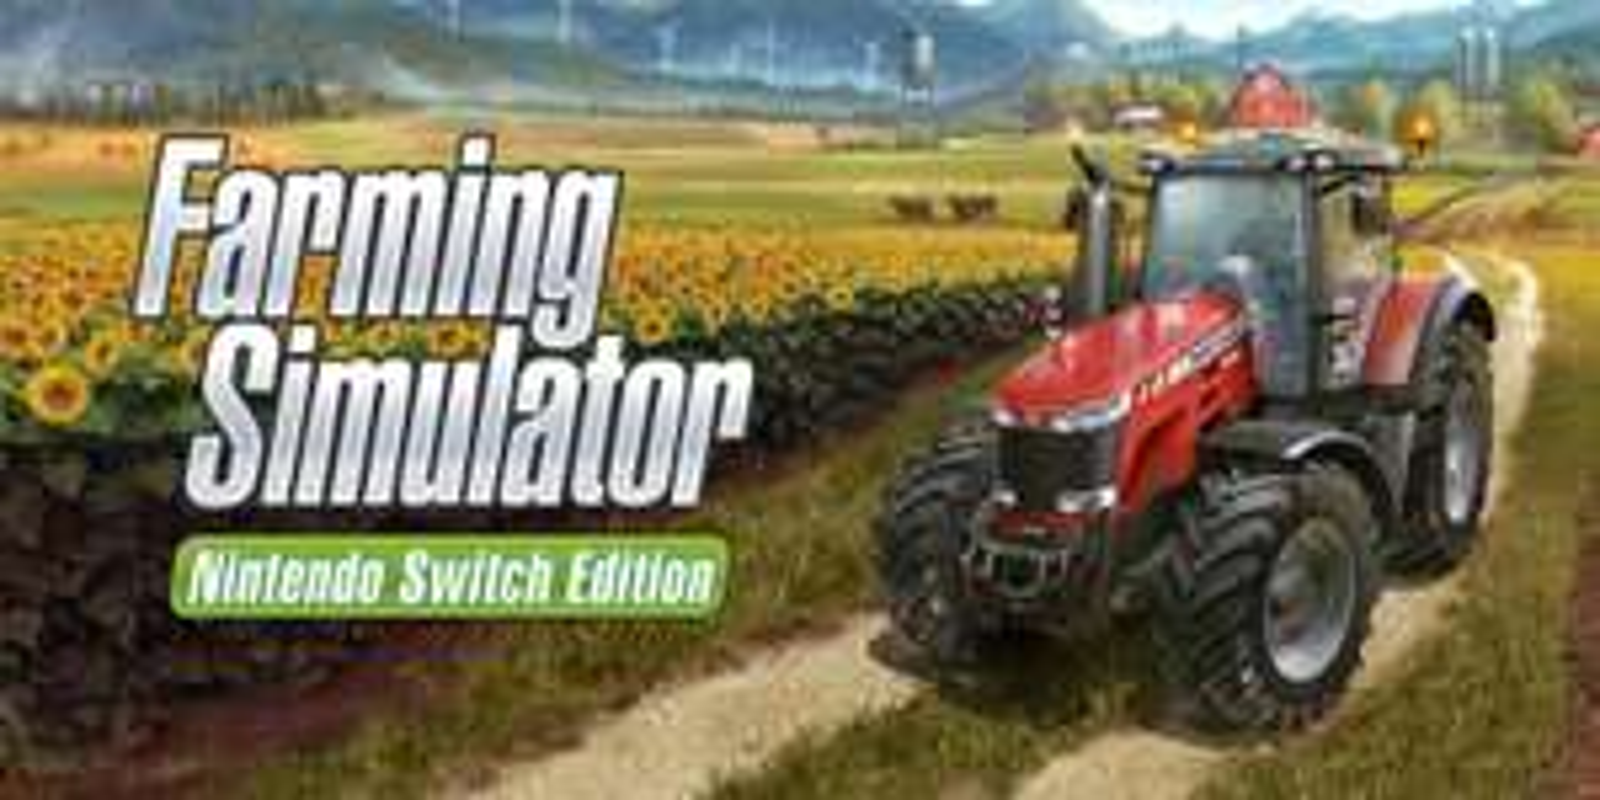 Farming Simulator Nintendo Switch Edition £12.99 at Nintendo Shop